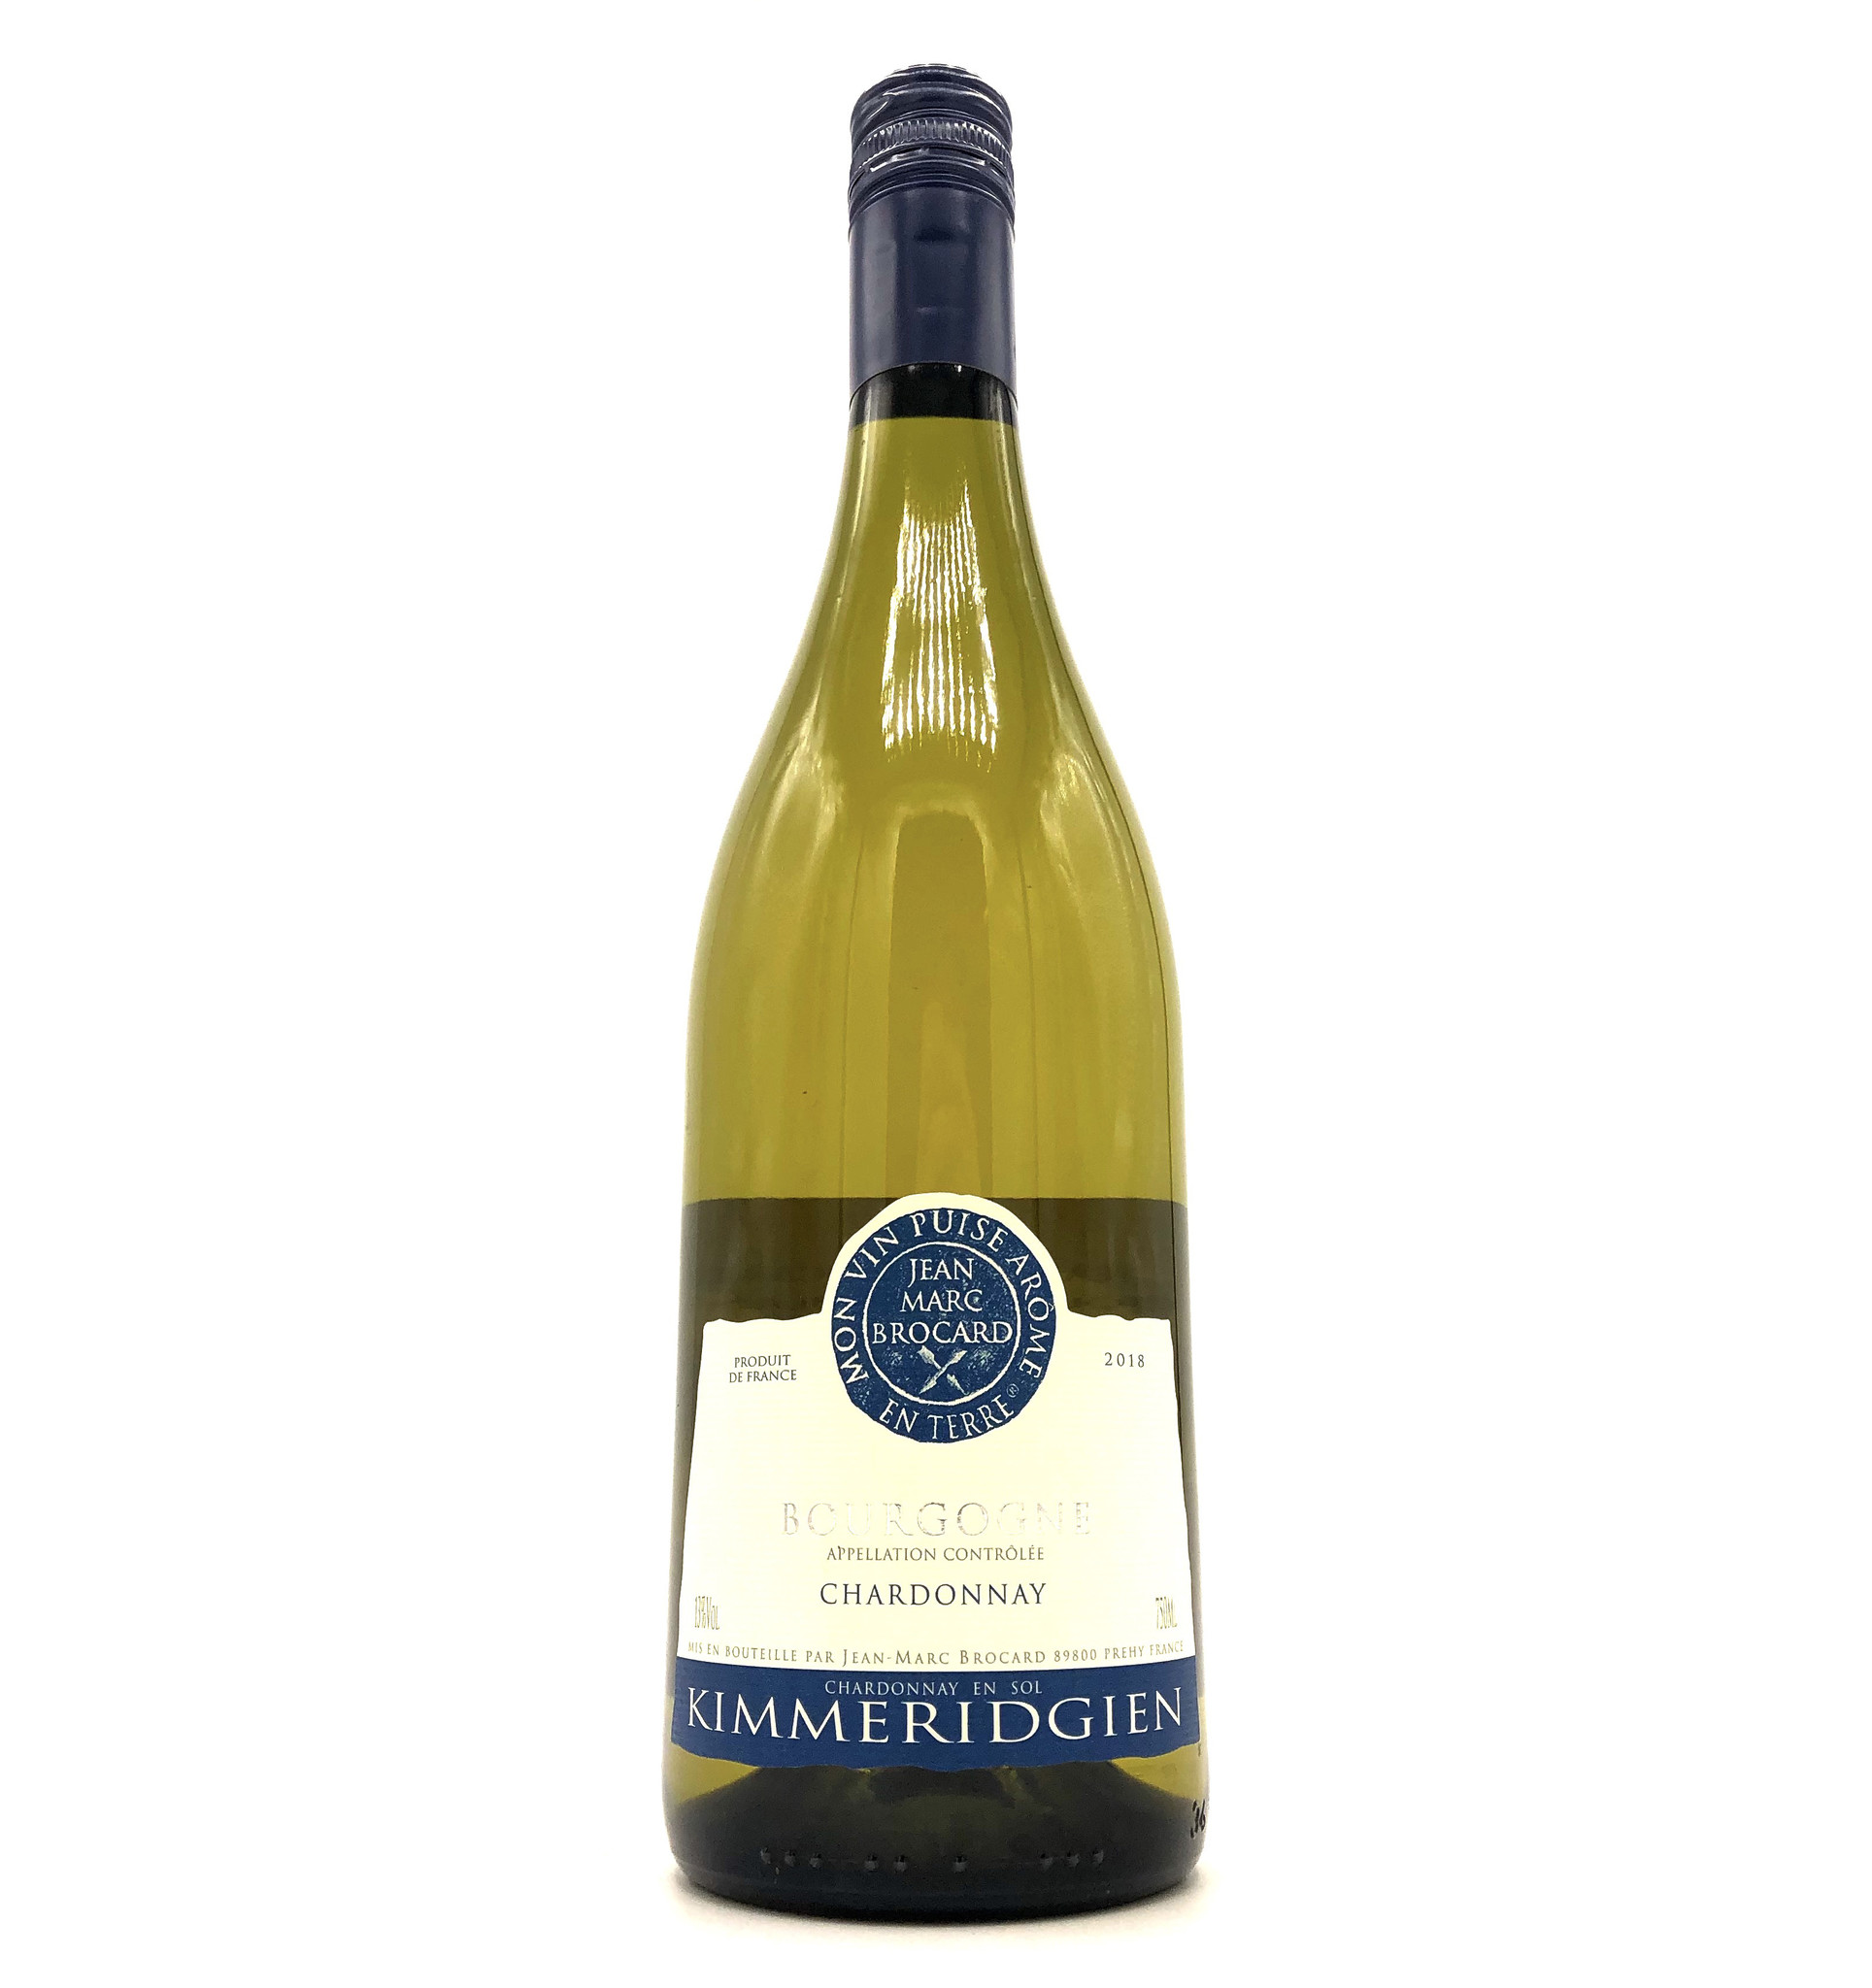 Bourgogne Chardonnay 2018 Brocard